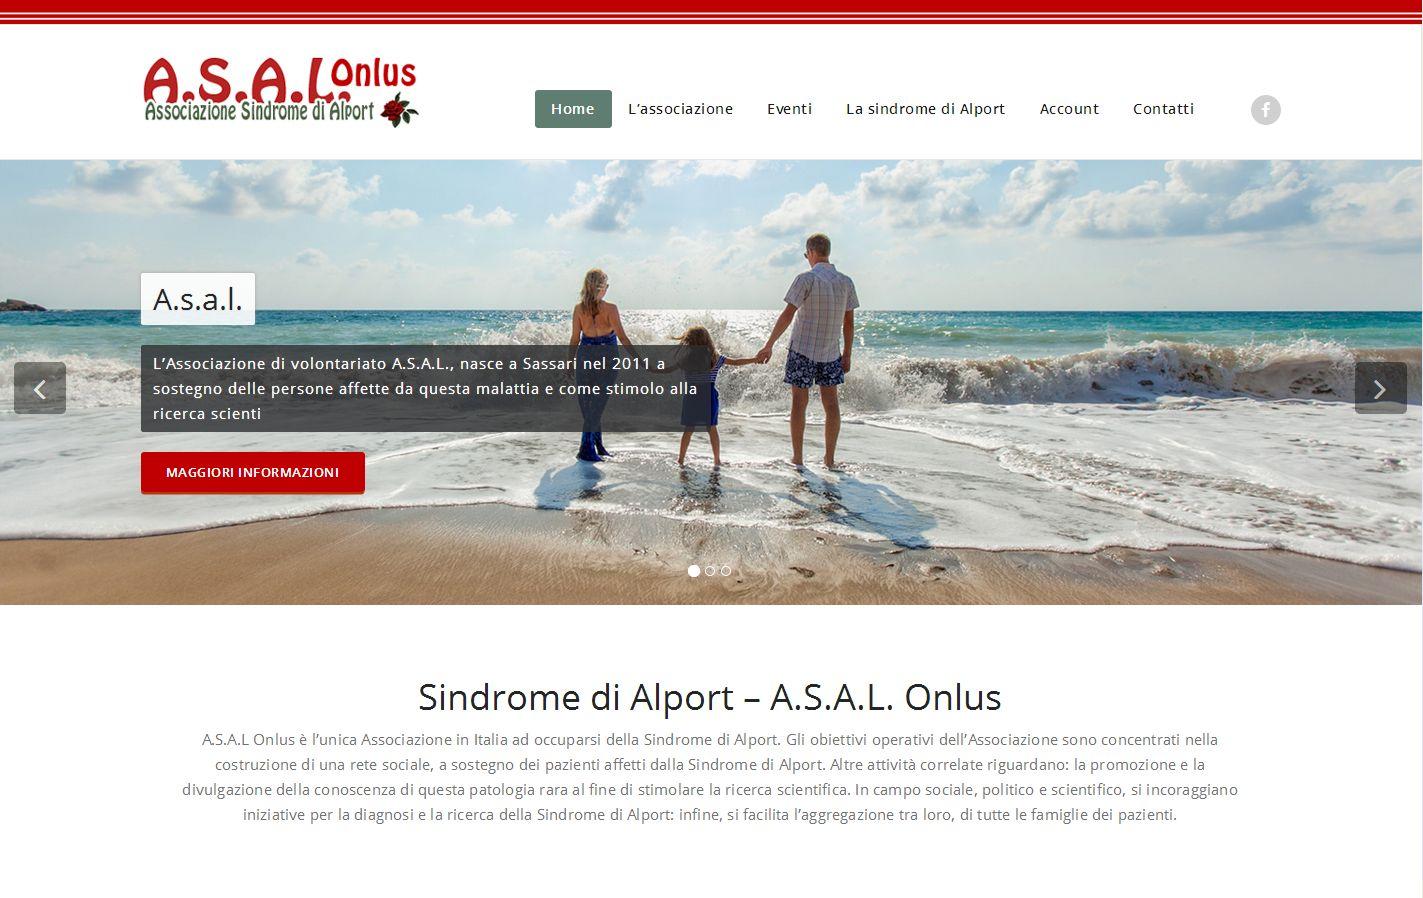 Associazione Sindrome di Alport Onlus